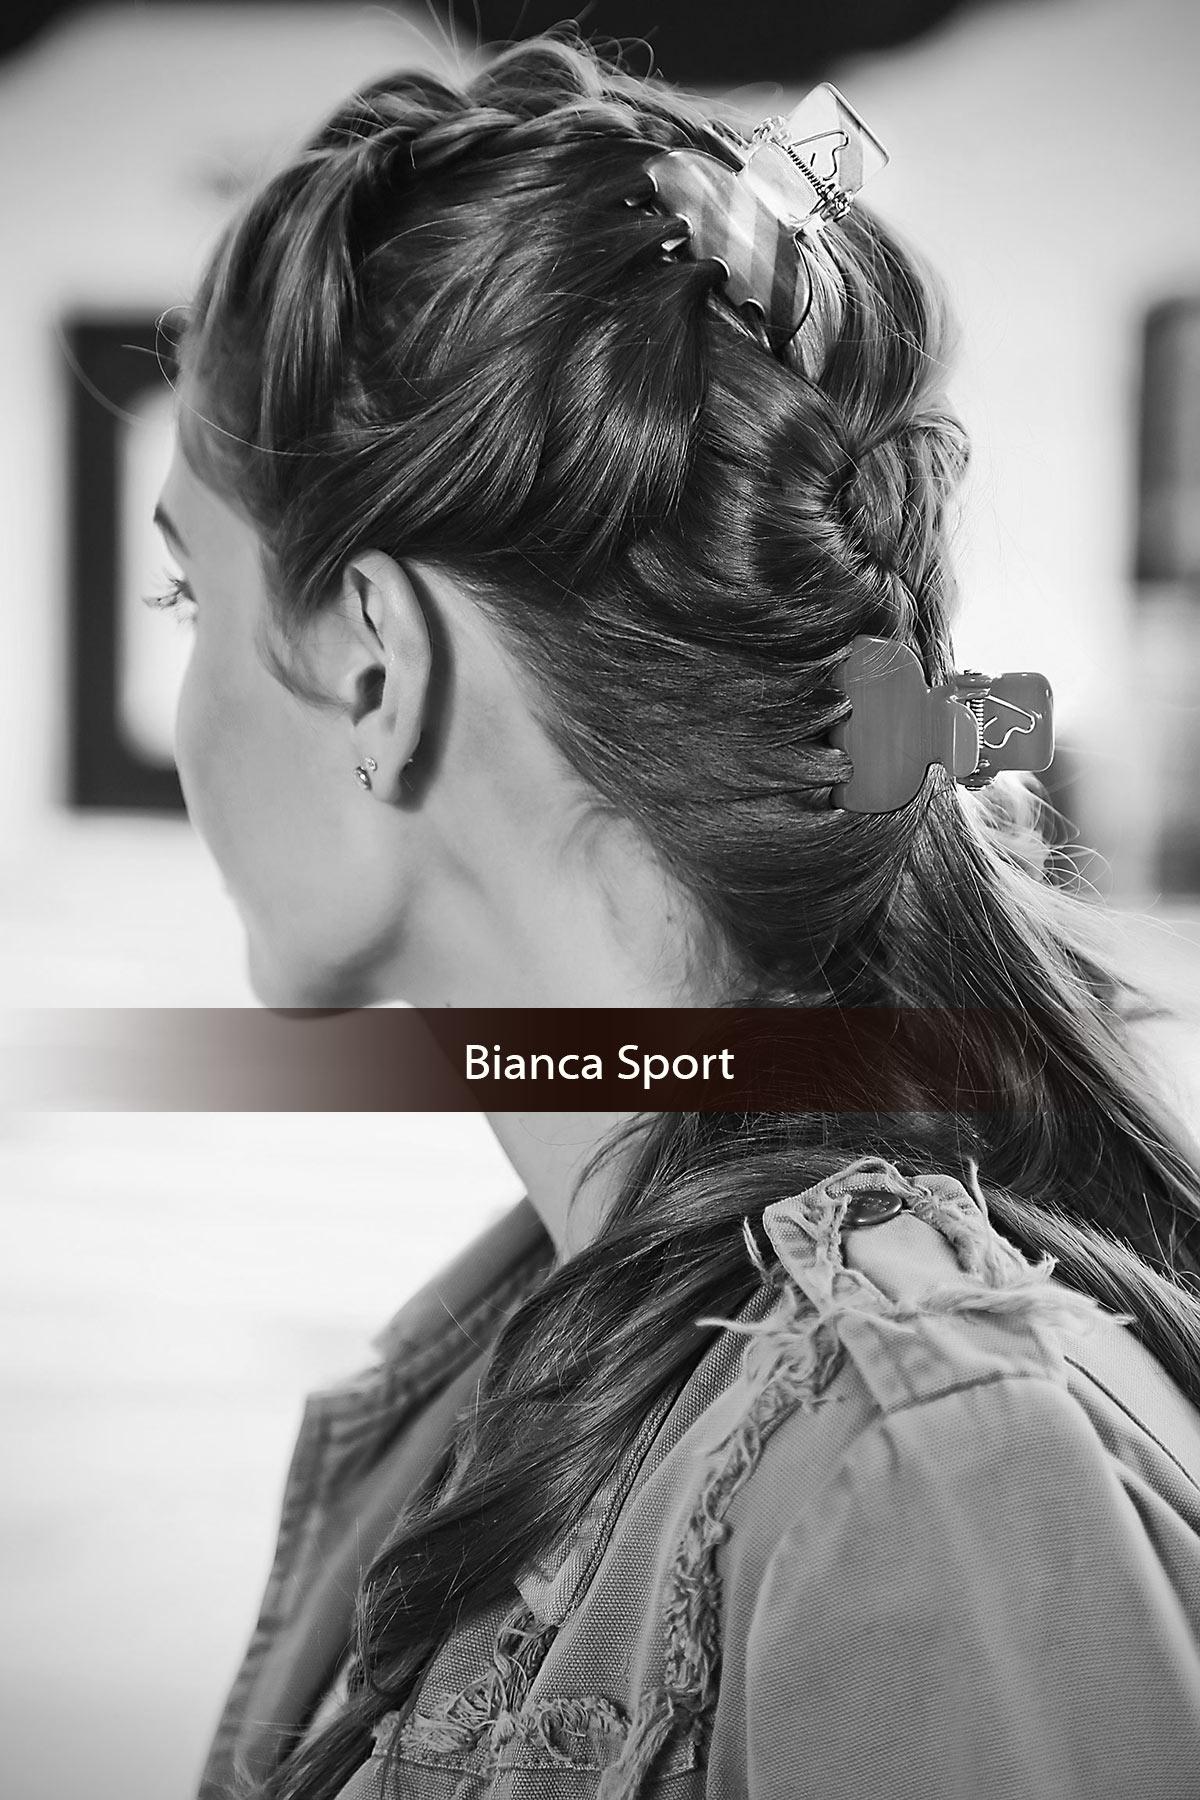 Bianca Sport